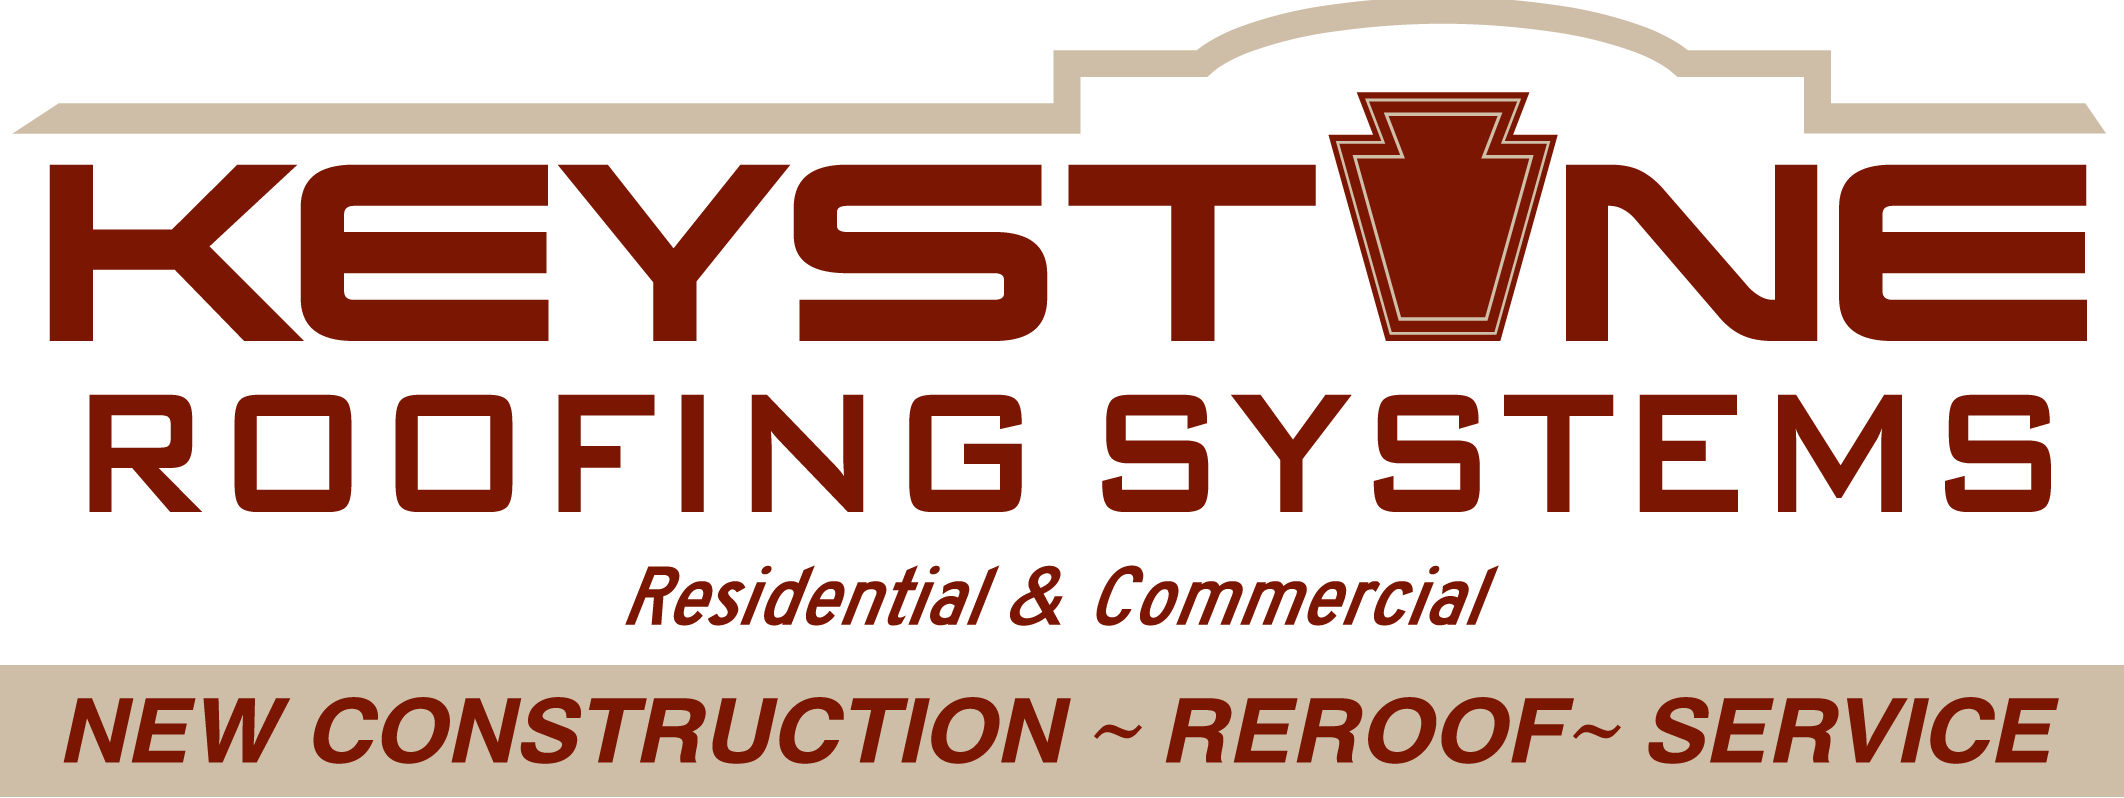 https://keystoneroofingsystems.com/wp-content/uploads/2021/05/Keystone-Roofing_newest.png